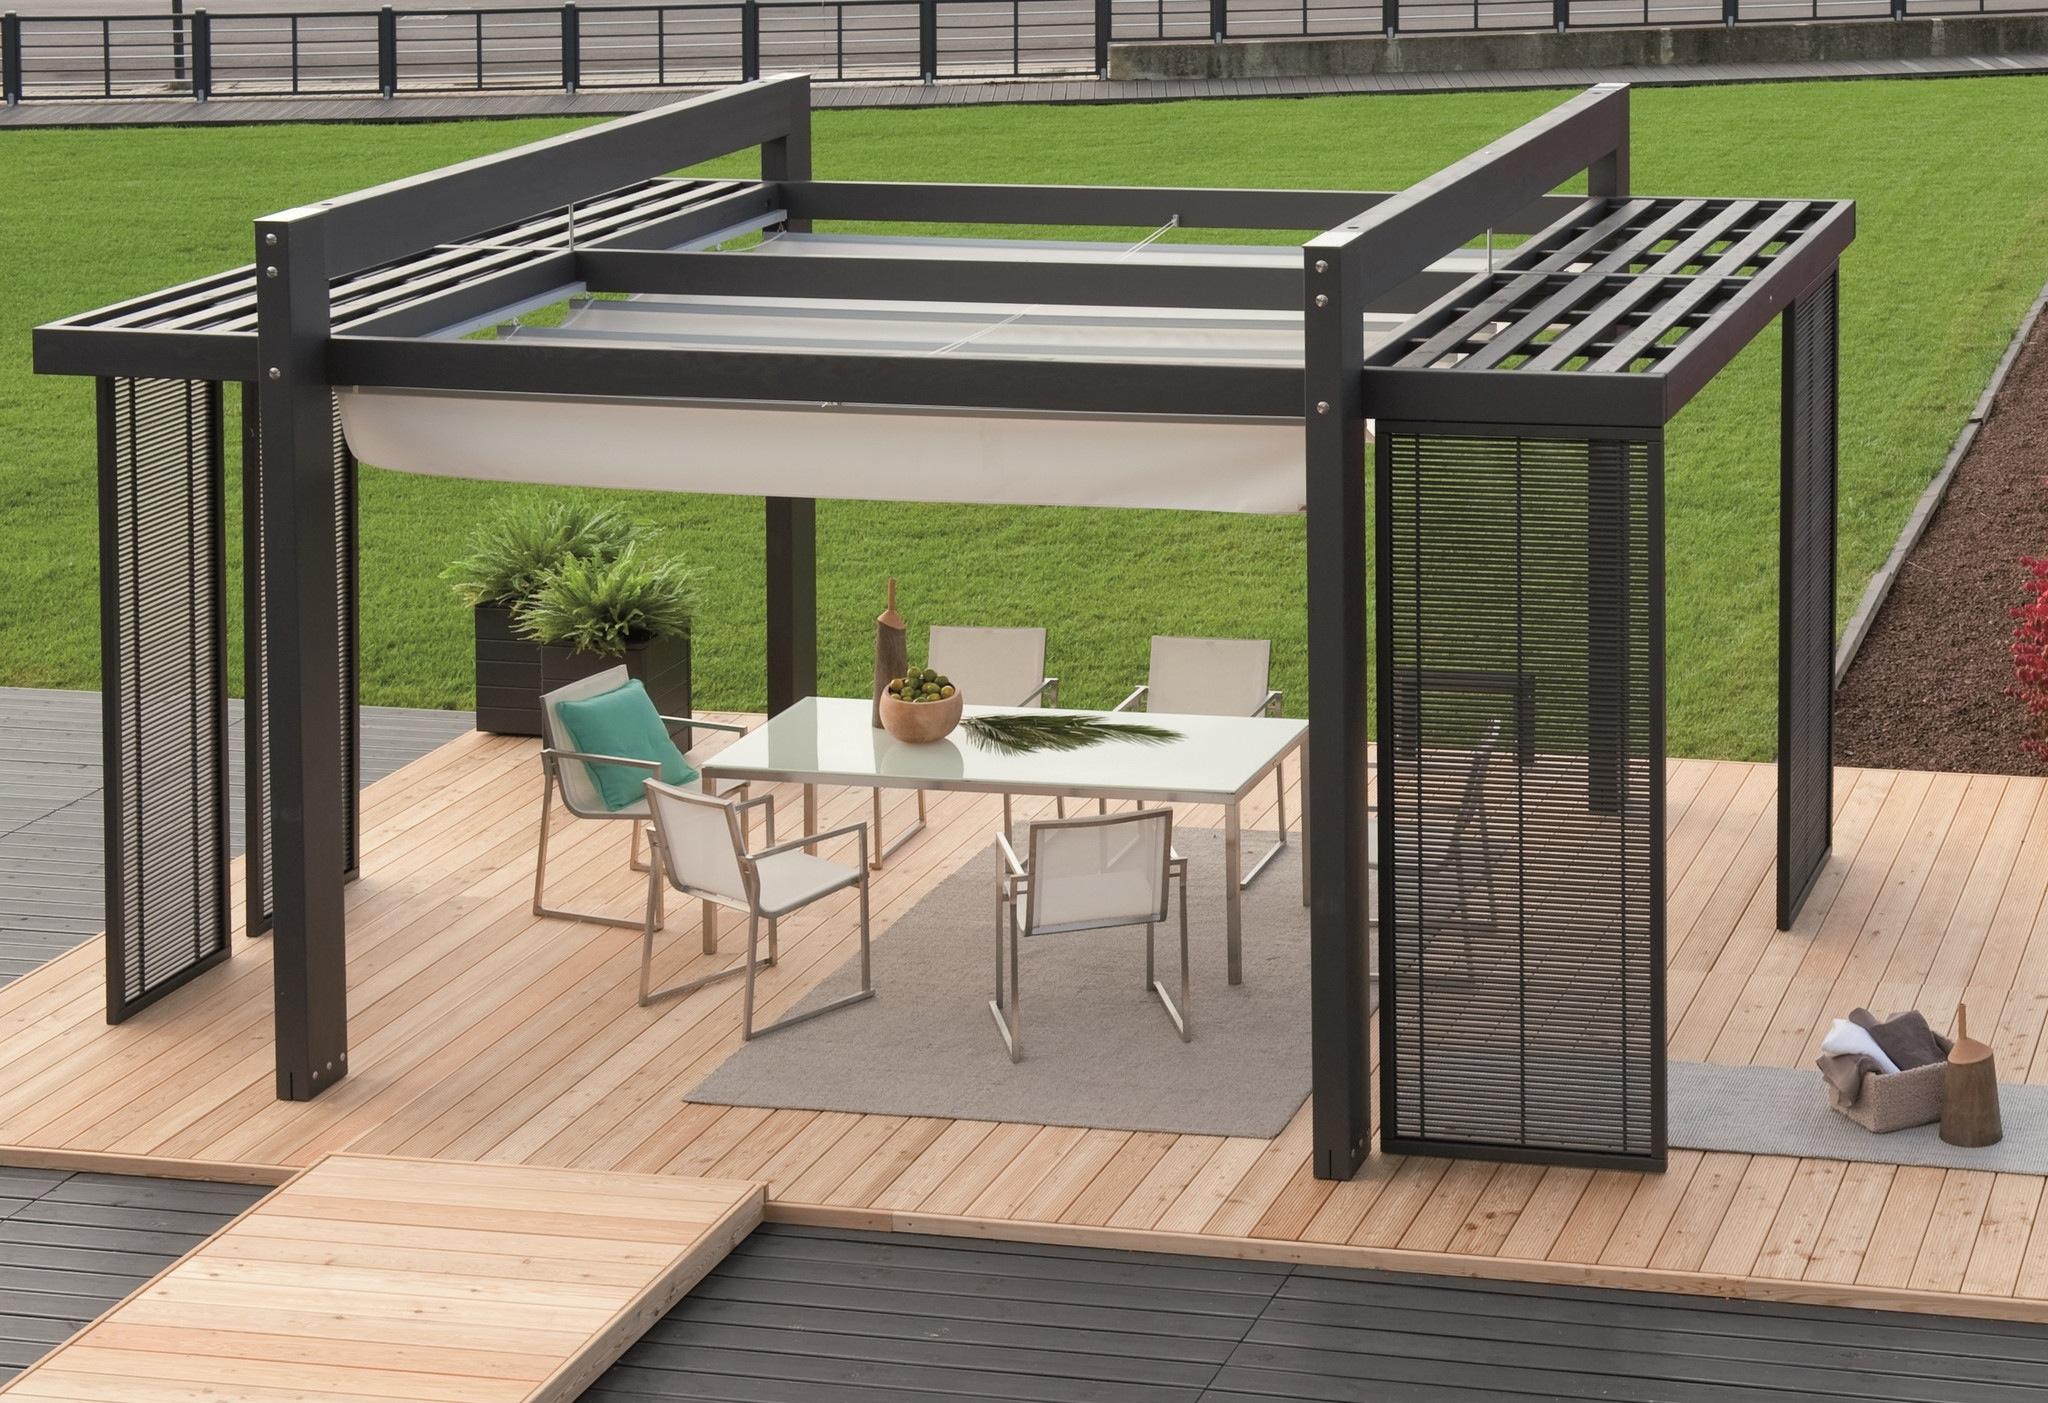 20 inspiring contemporary pergolas and outdoor spaces livin spaces. Black Bedroom Furniture Sets. Home Design Ideas